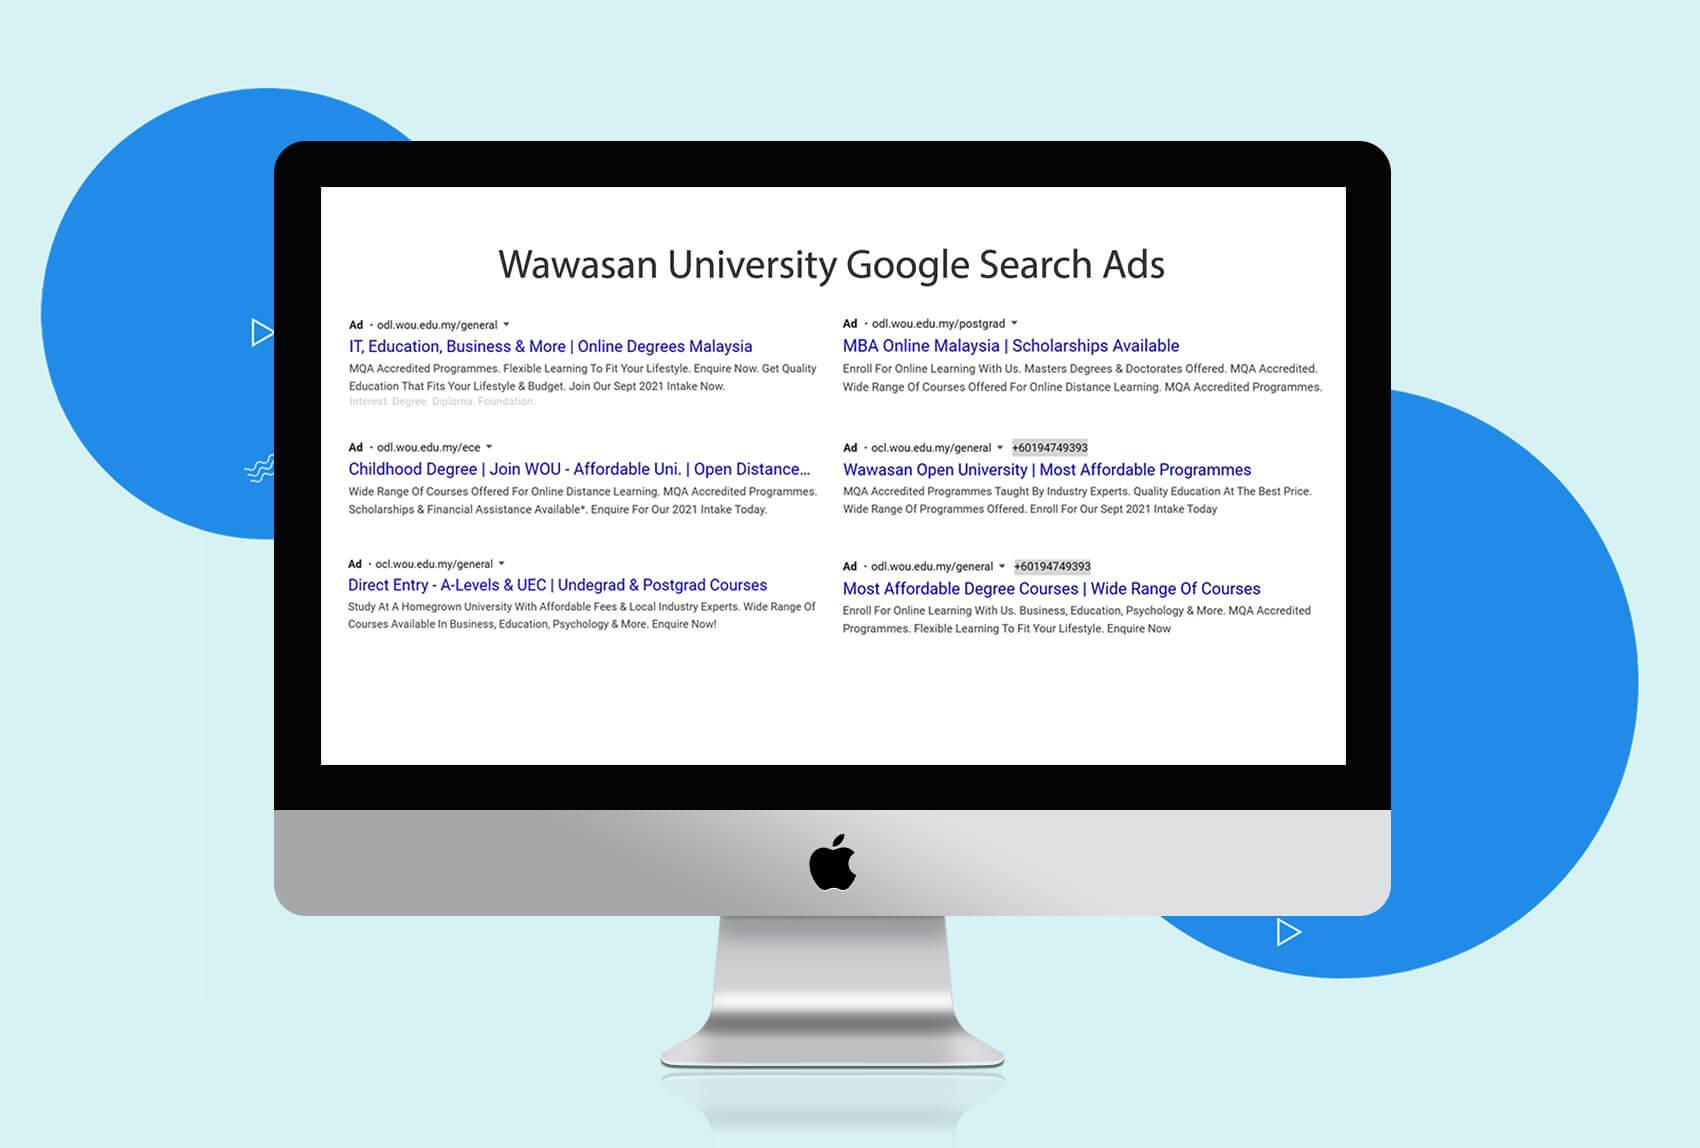 wawasan-google-search-ads-text